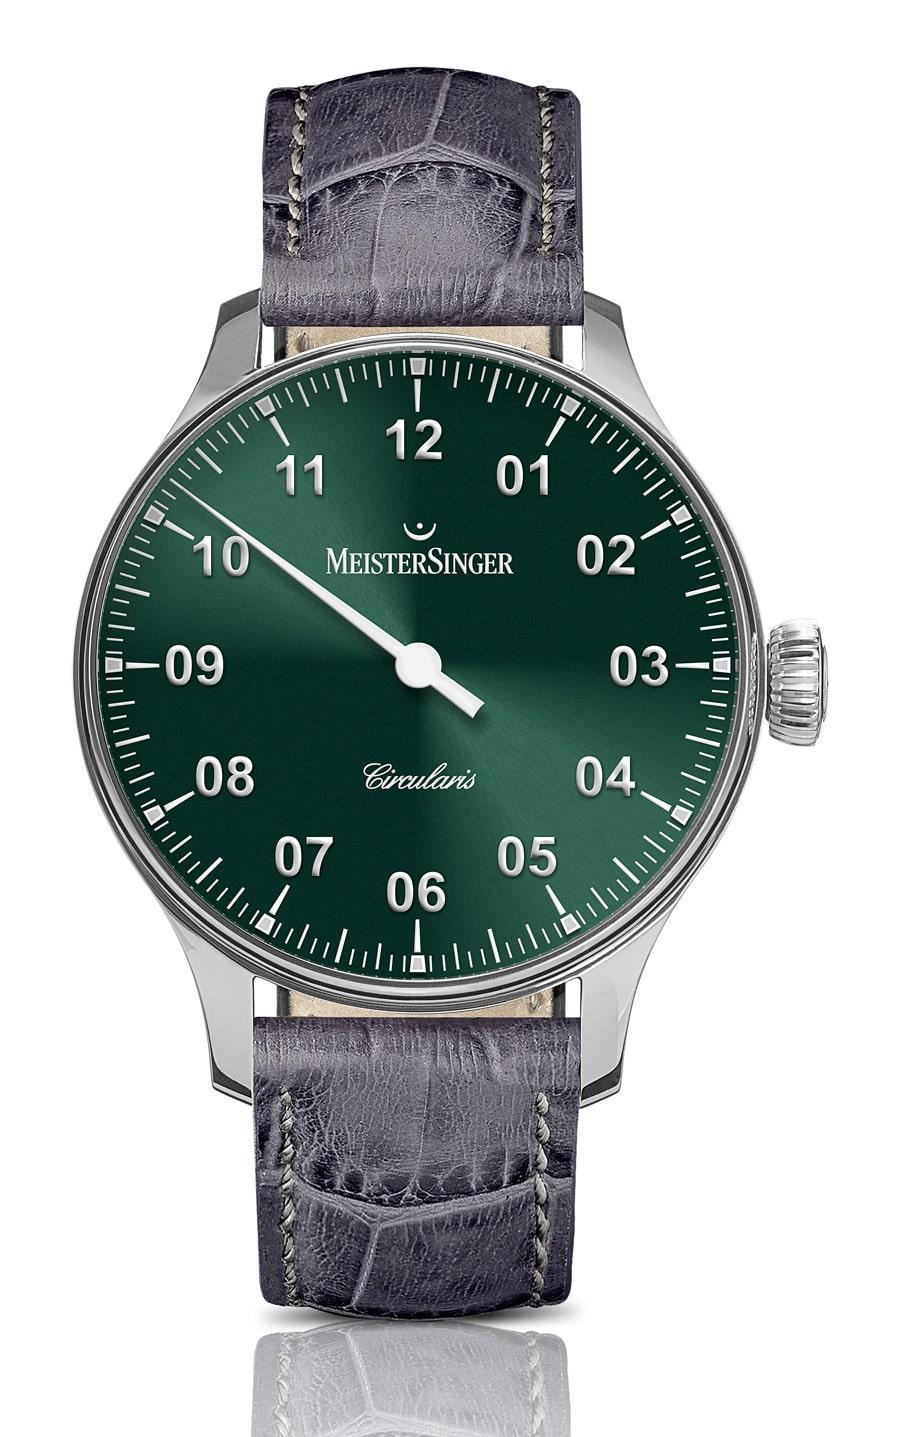 Meistersinger: Circularis Handaufzug Rensing-Green